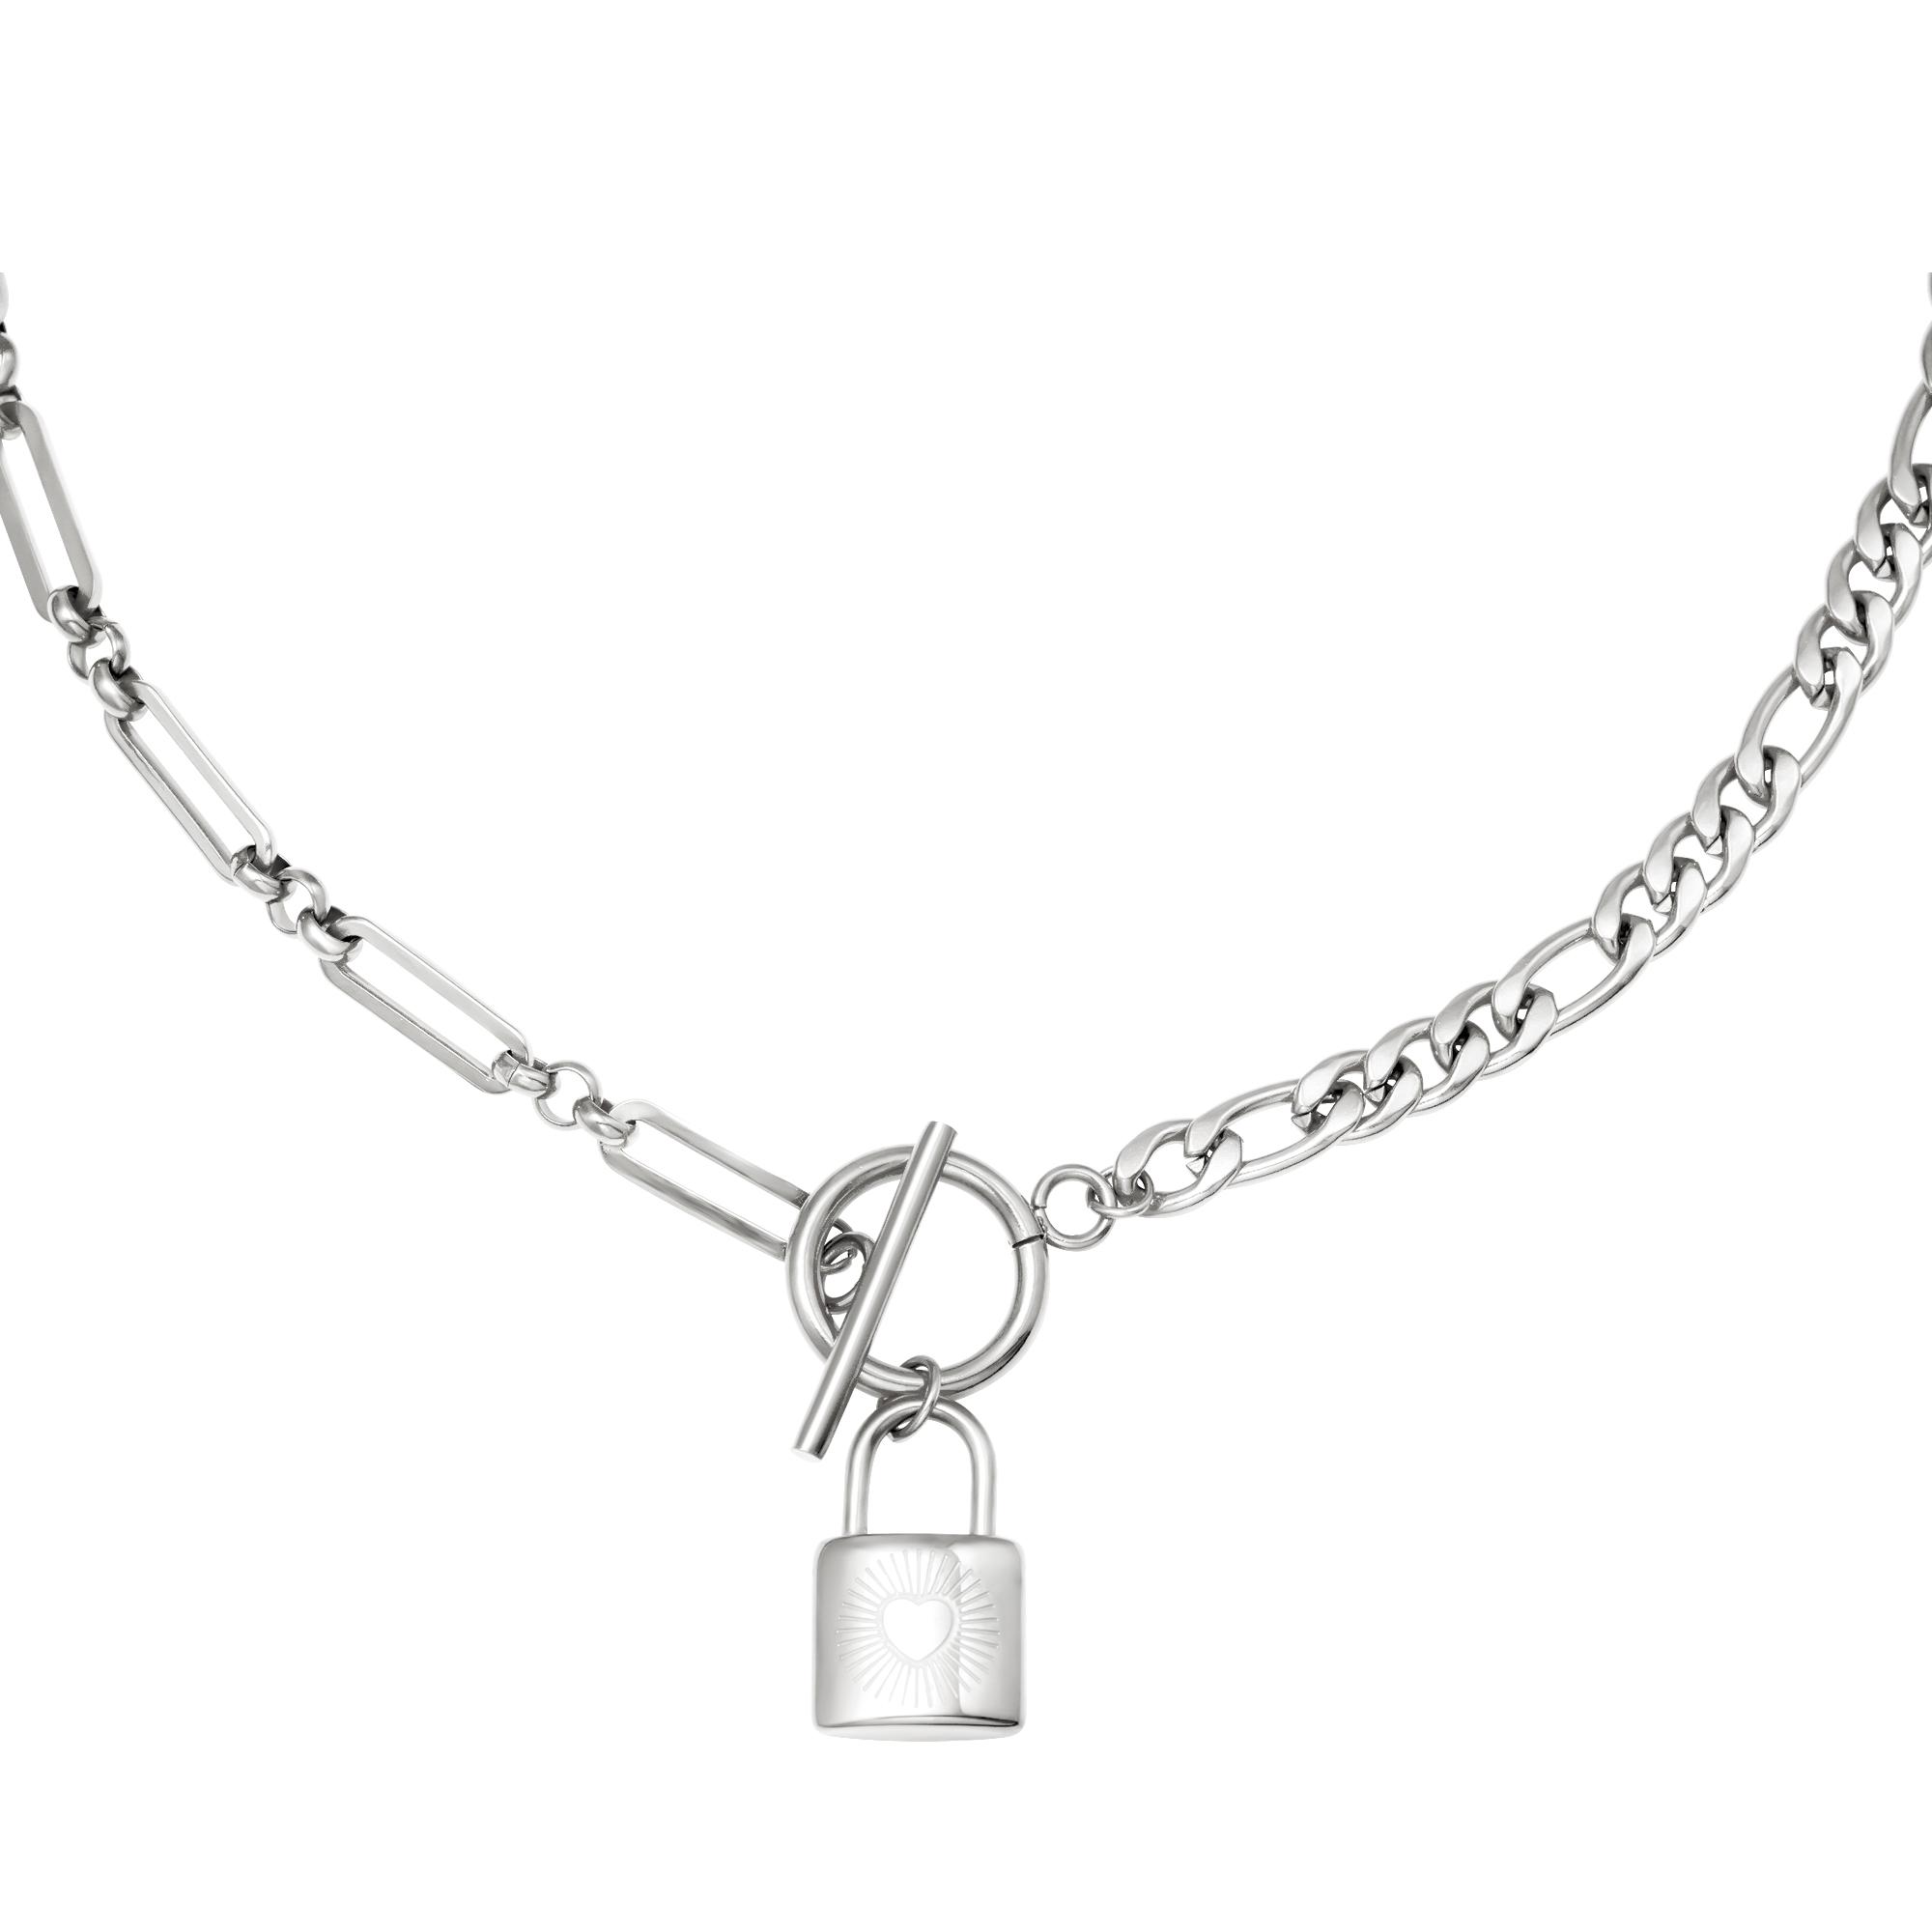 Ketting Chain & Lock - Zilver